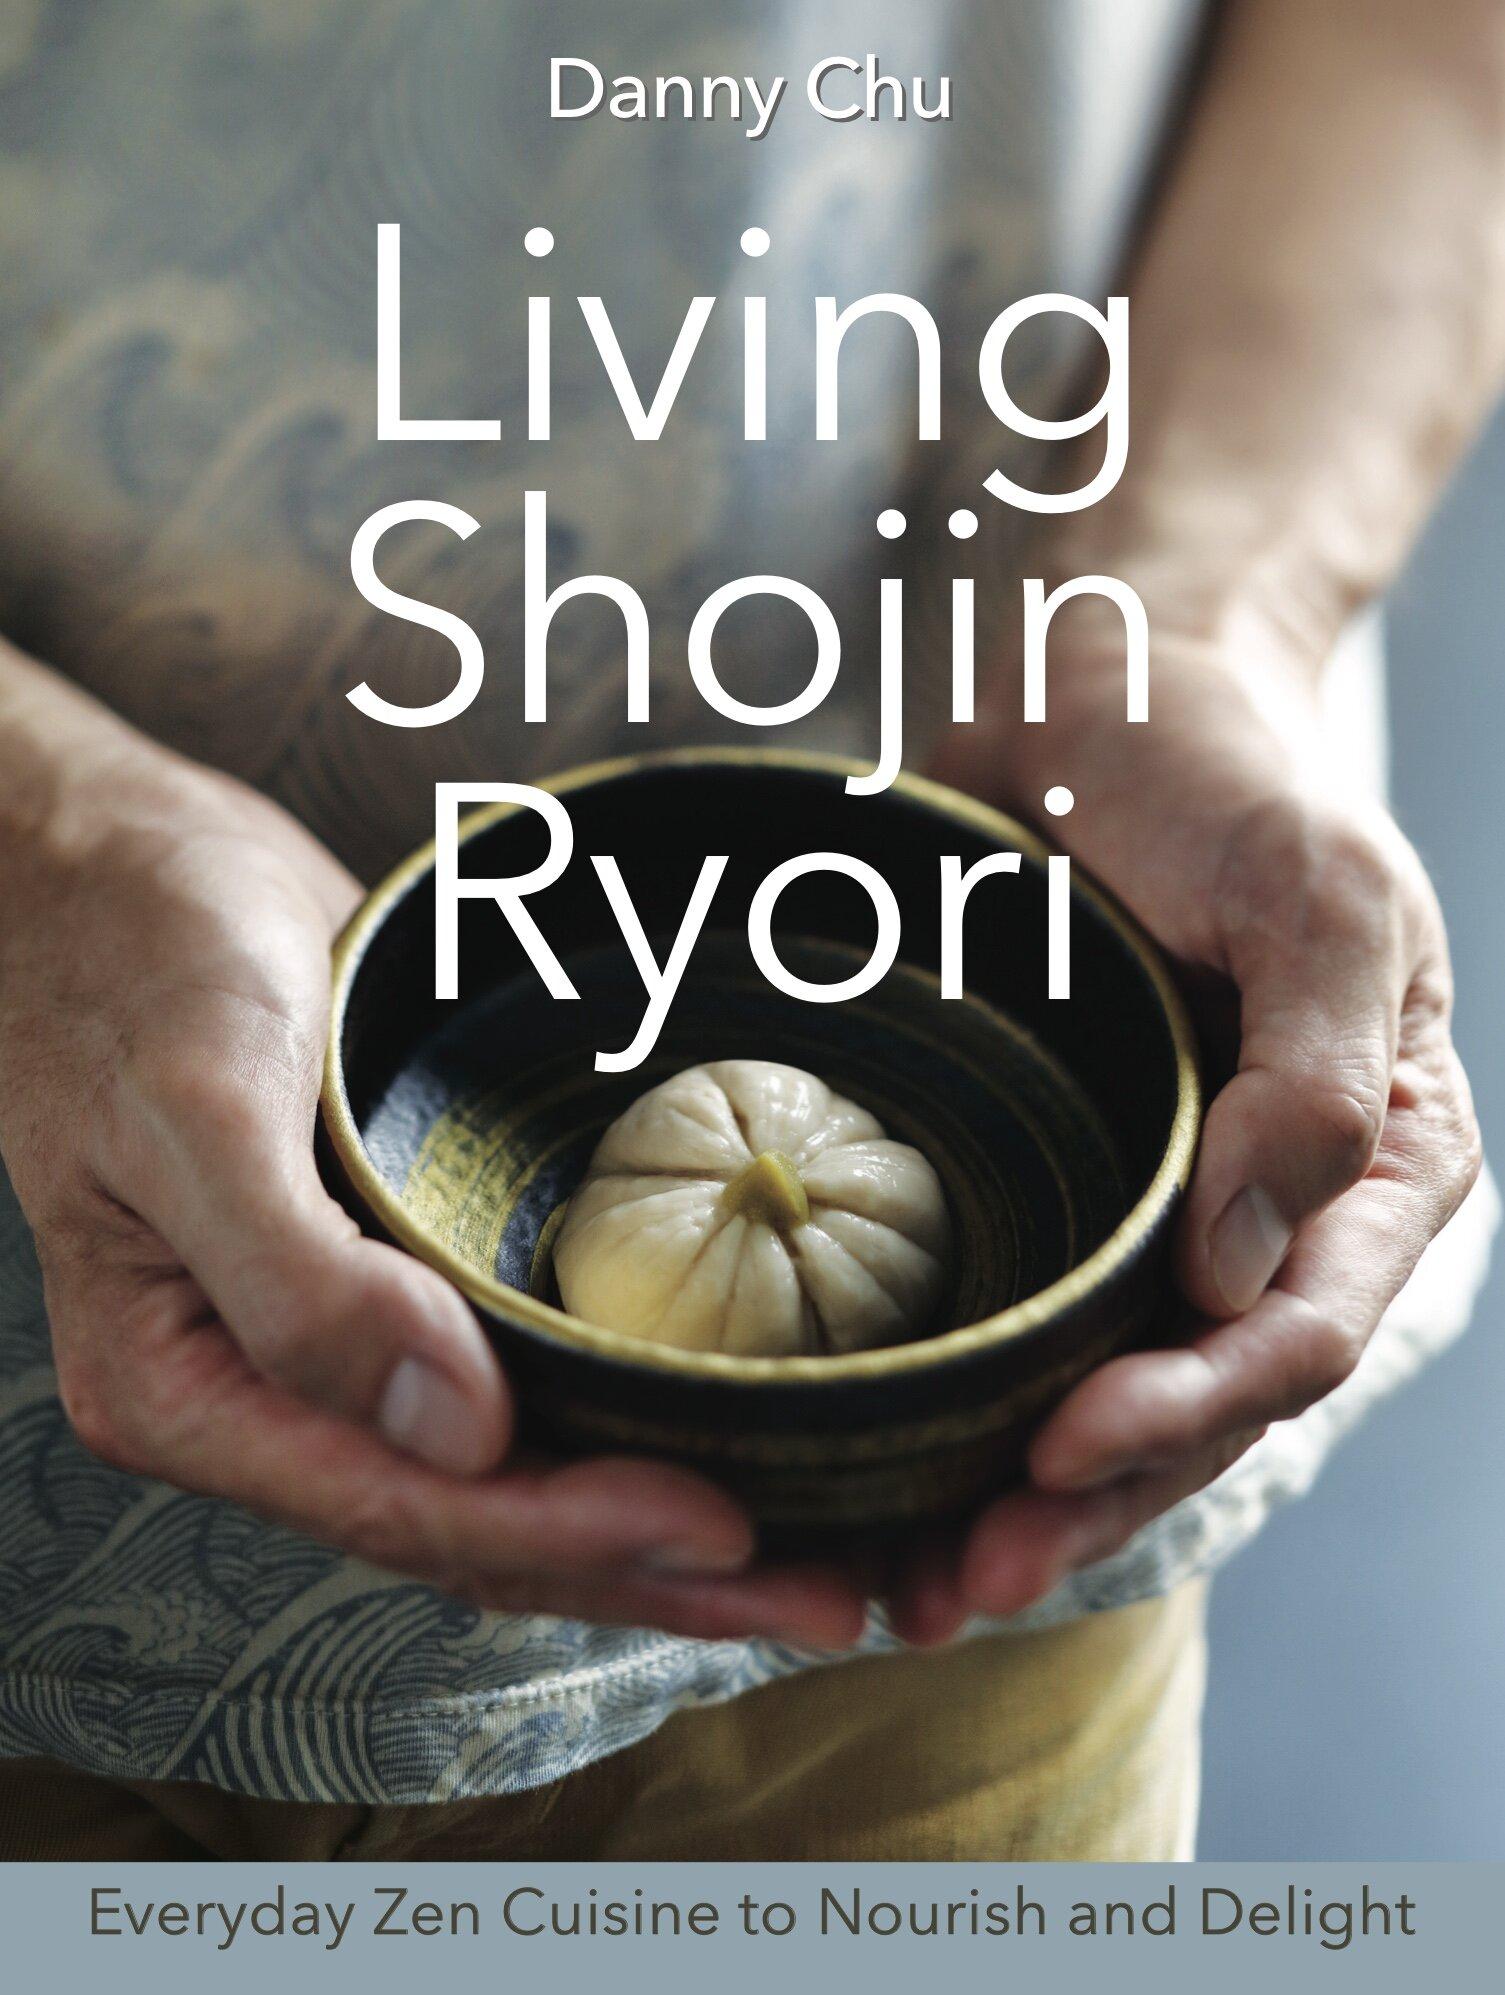 Living Shojin Ryori cookbook